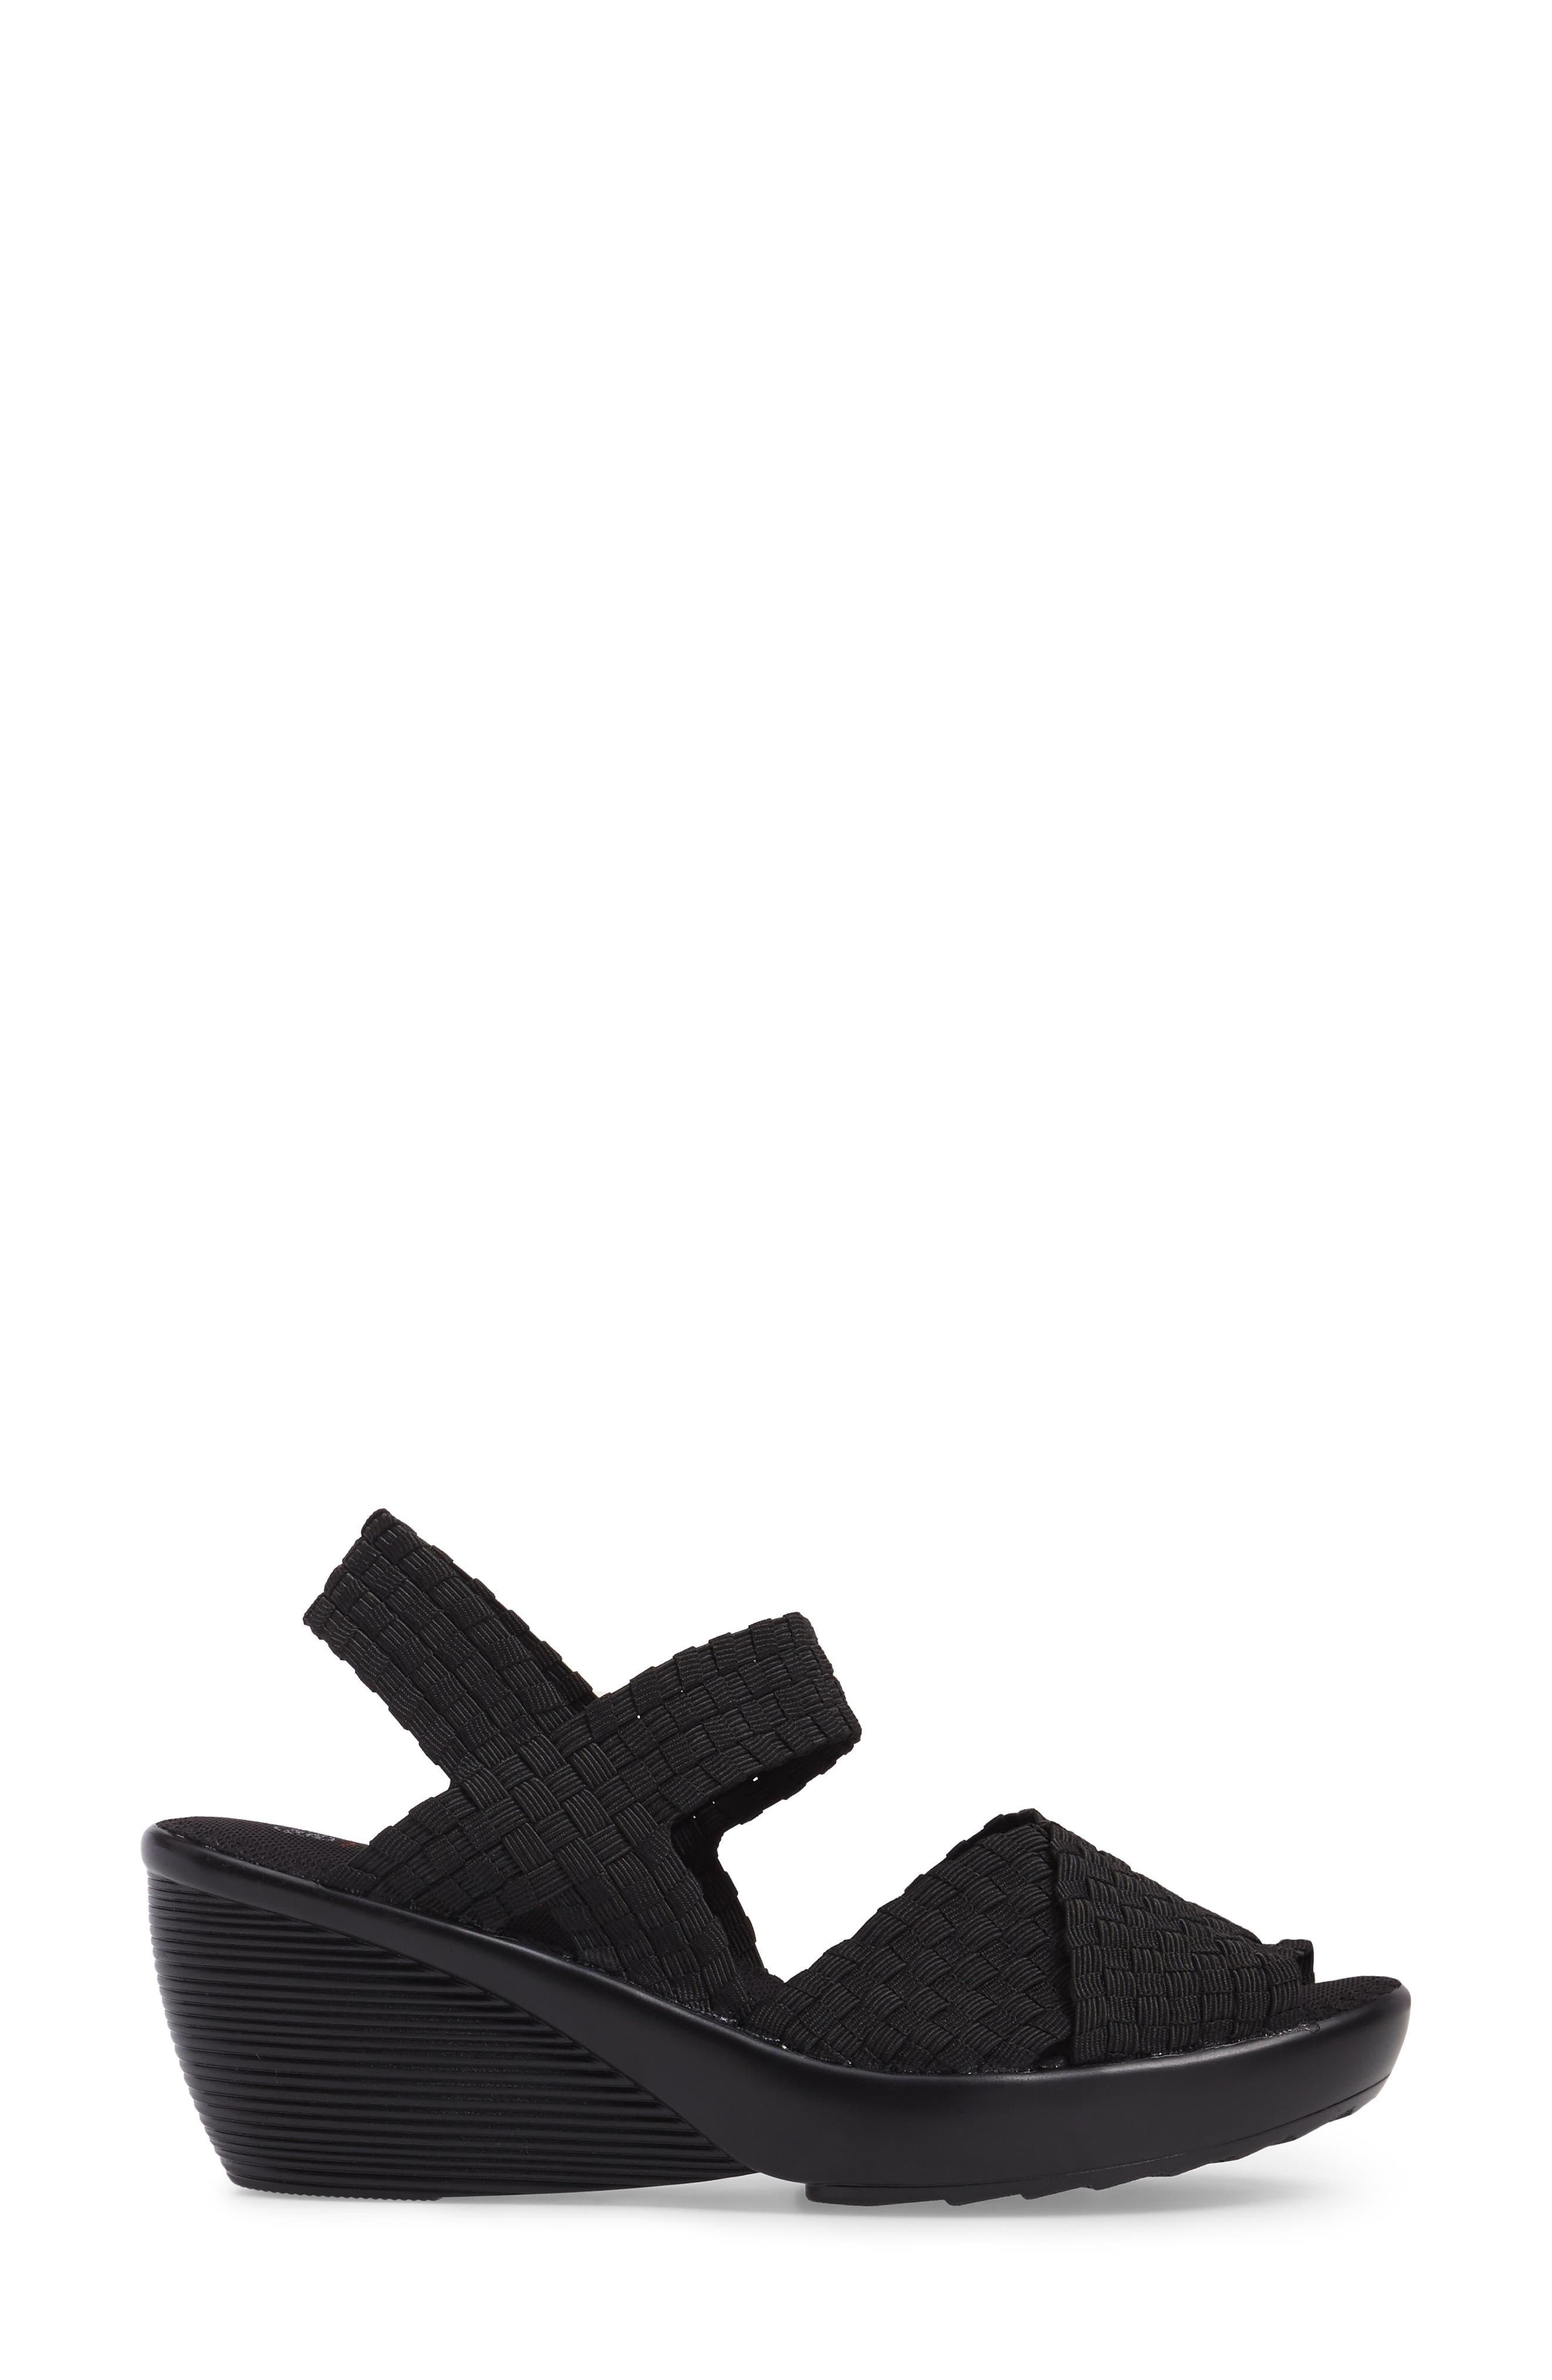 Fresh Buttercup Sandal,                             Alternate thumbnail 3, color,                             BLACK FABRIC